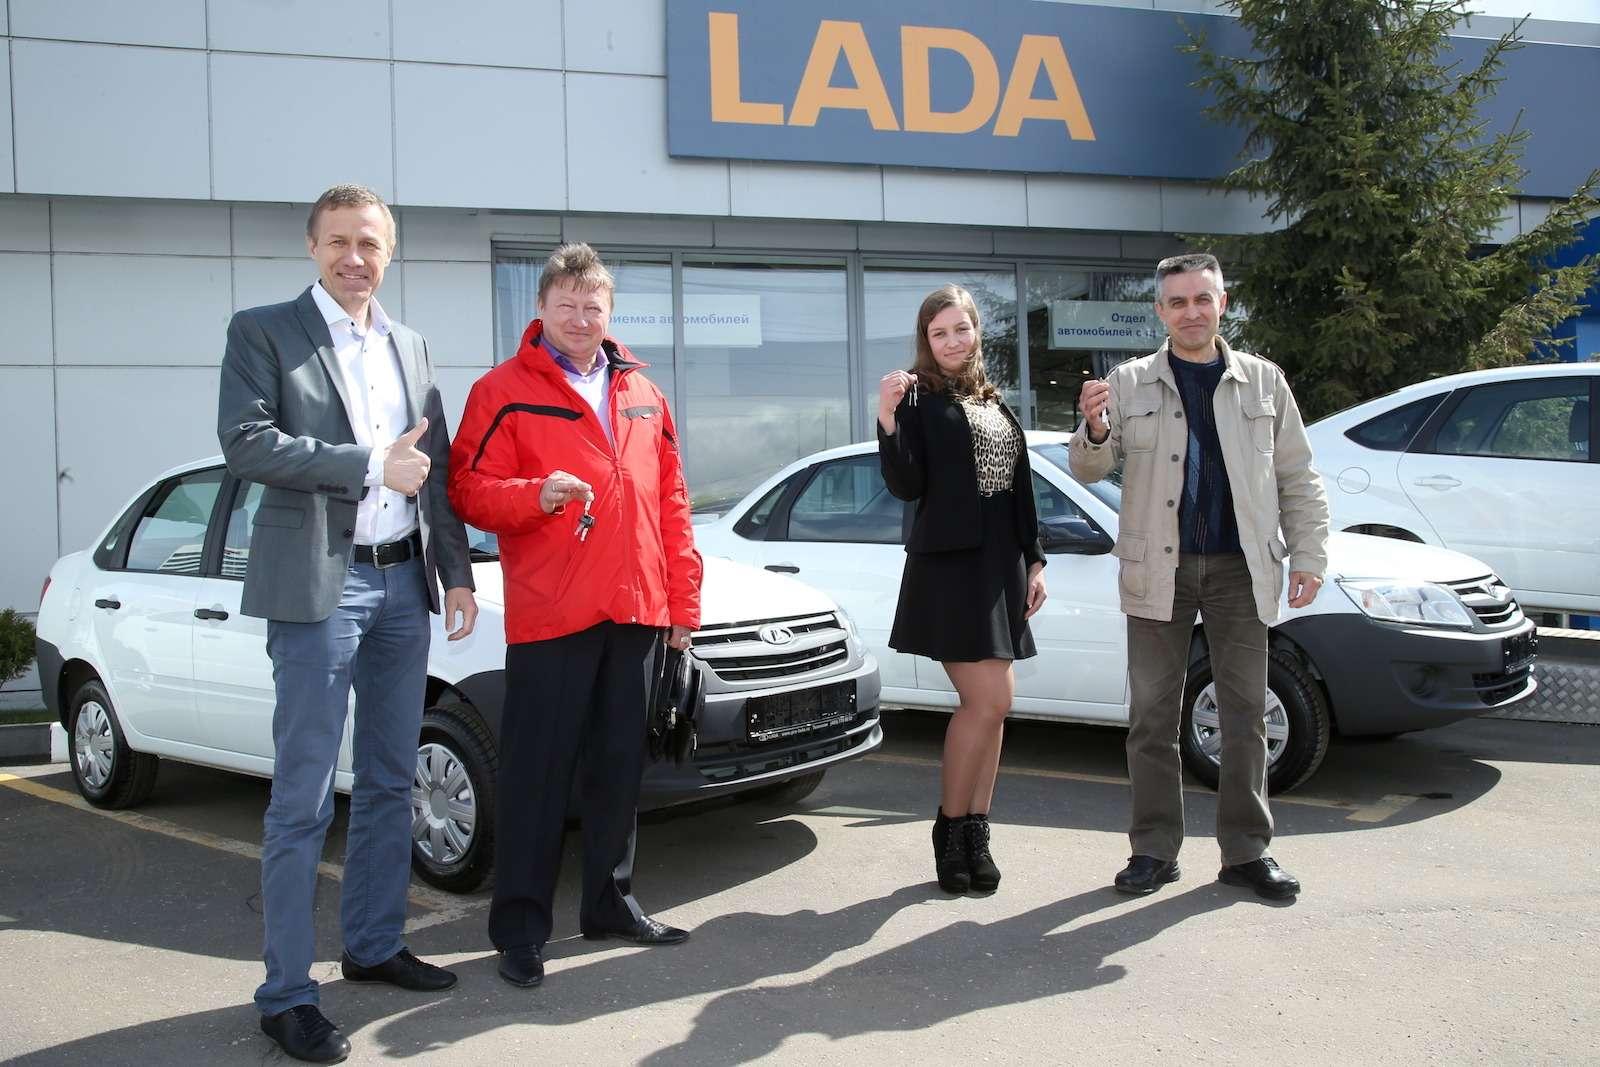 Гран-при «Зарулем»: ключи оттрех Lada Granta переданы победителям— фото 580060